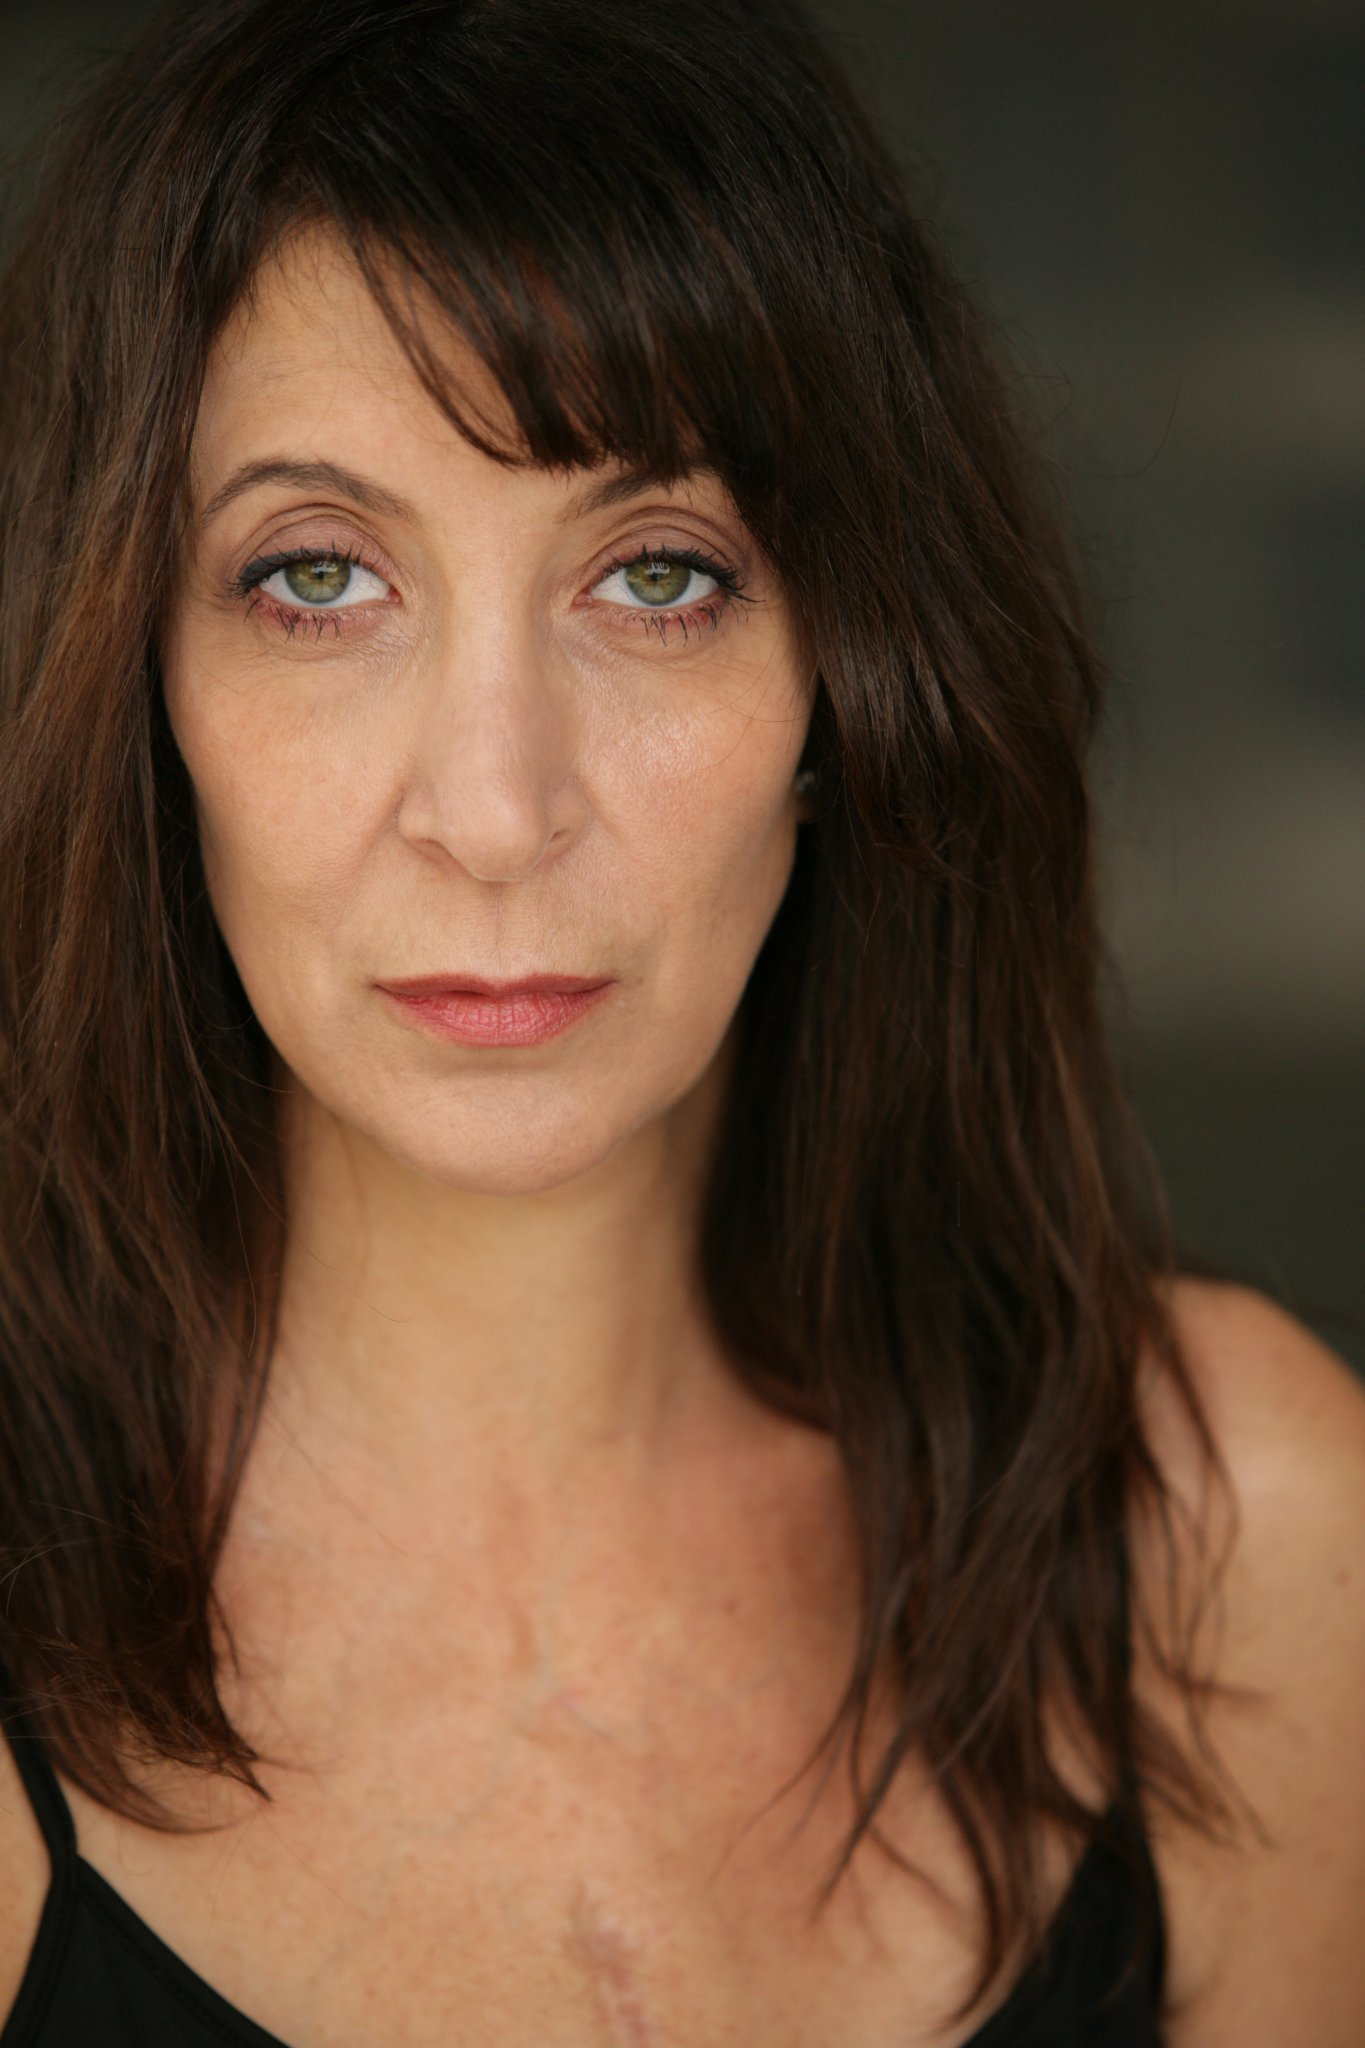 Watch Suzanne Krull video